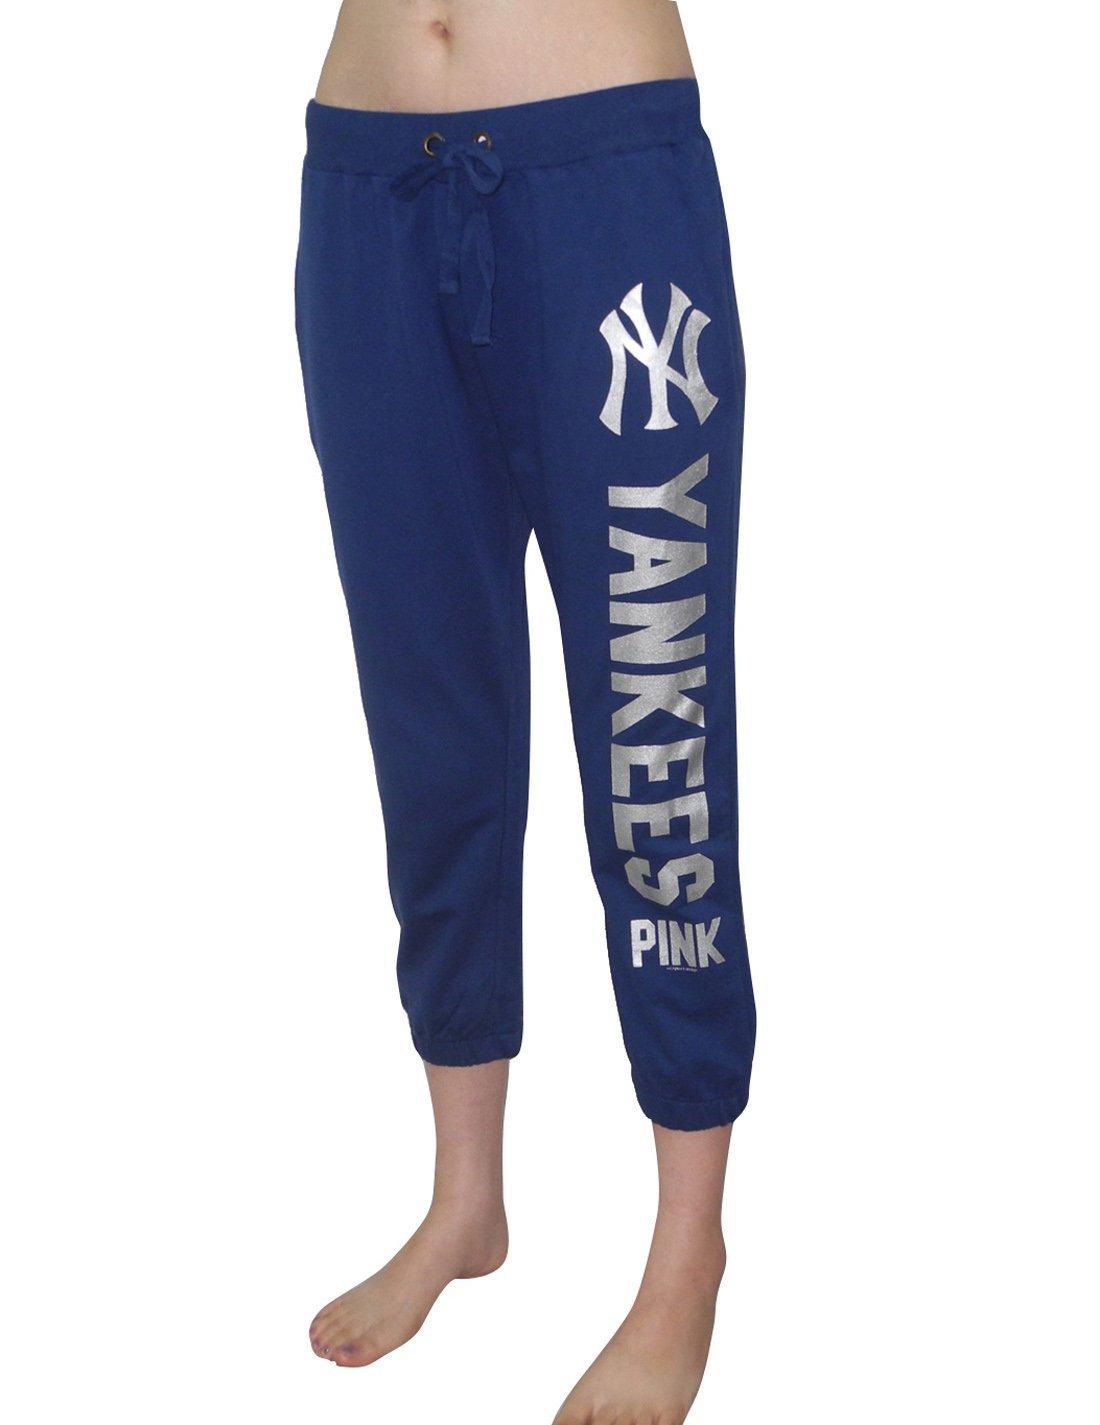 Mujer Rosa Victoria s Secret MLB New York Yankees Yoga Crop Pantalones - Azul Oscuro azul marino Talla:large: Amazon.es: Deportes y aire libre